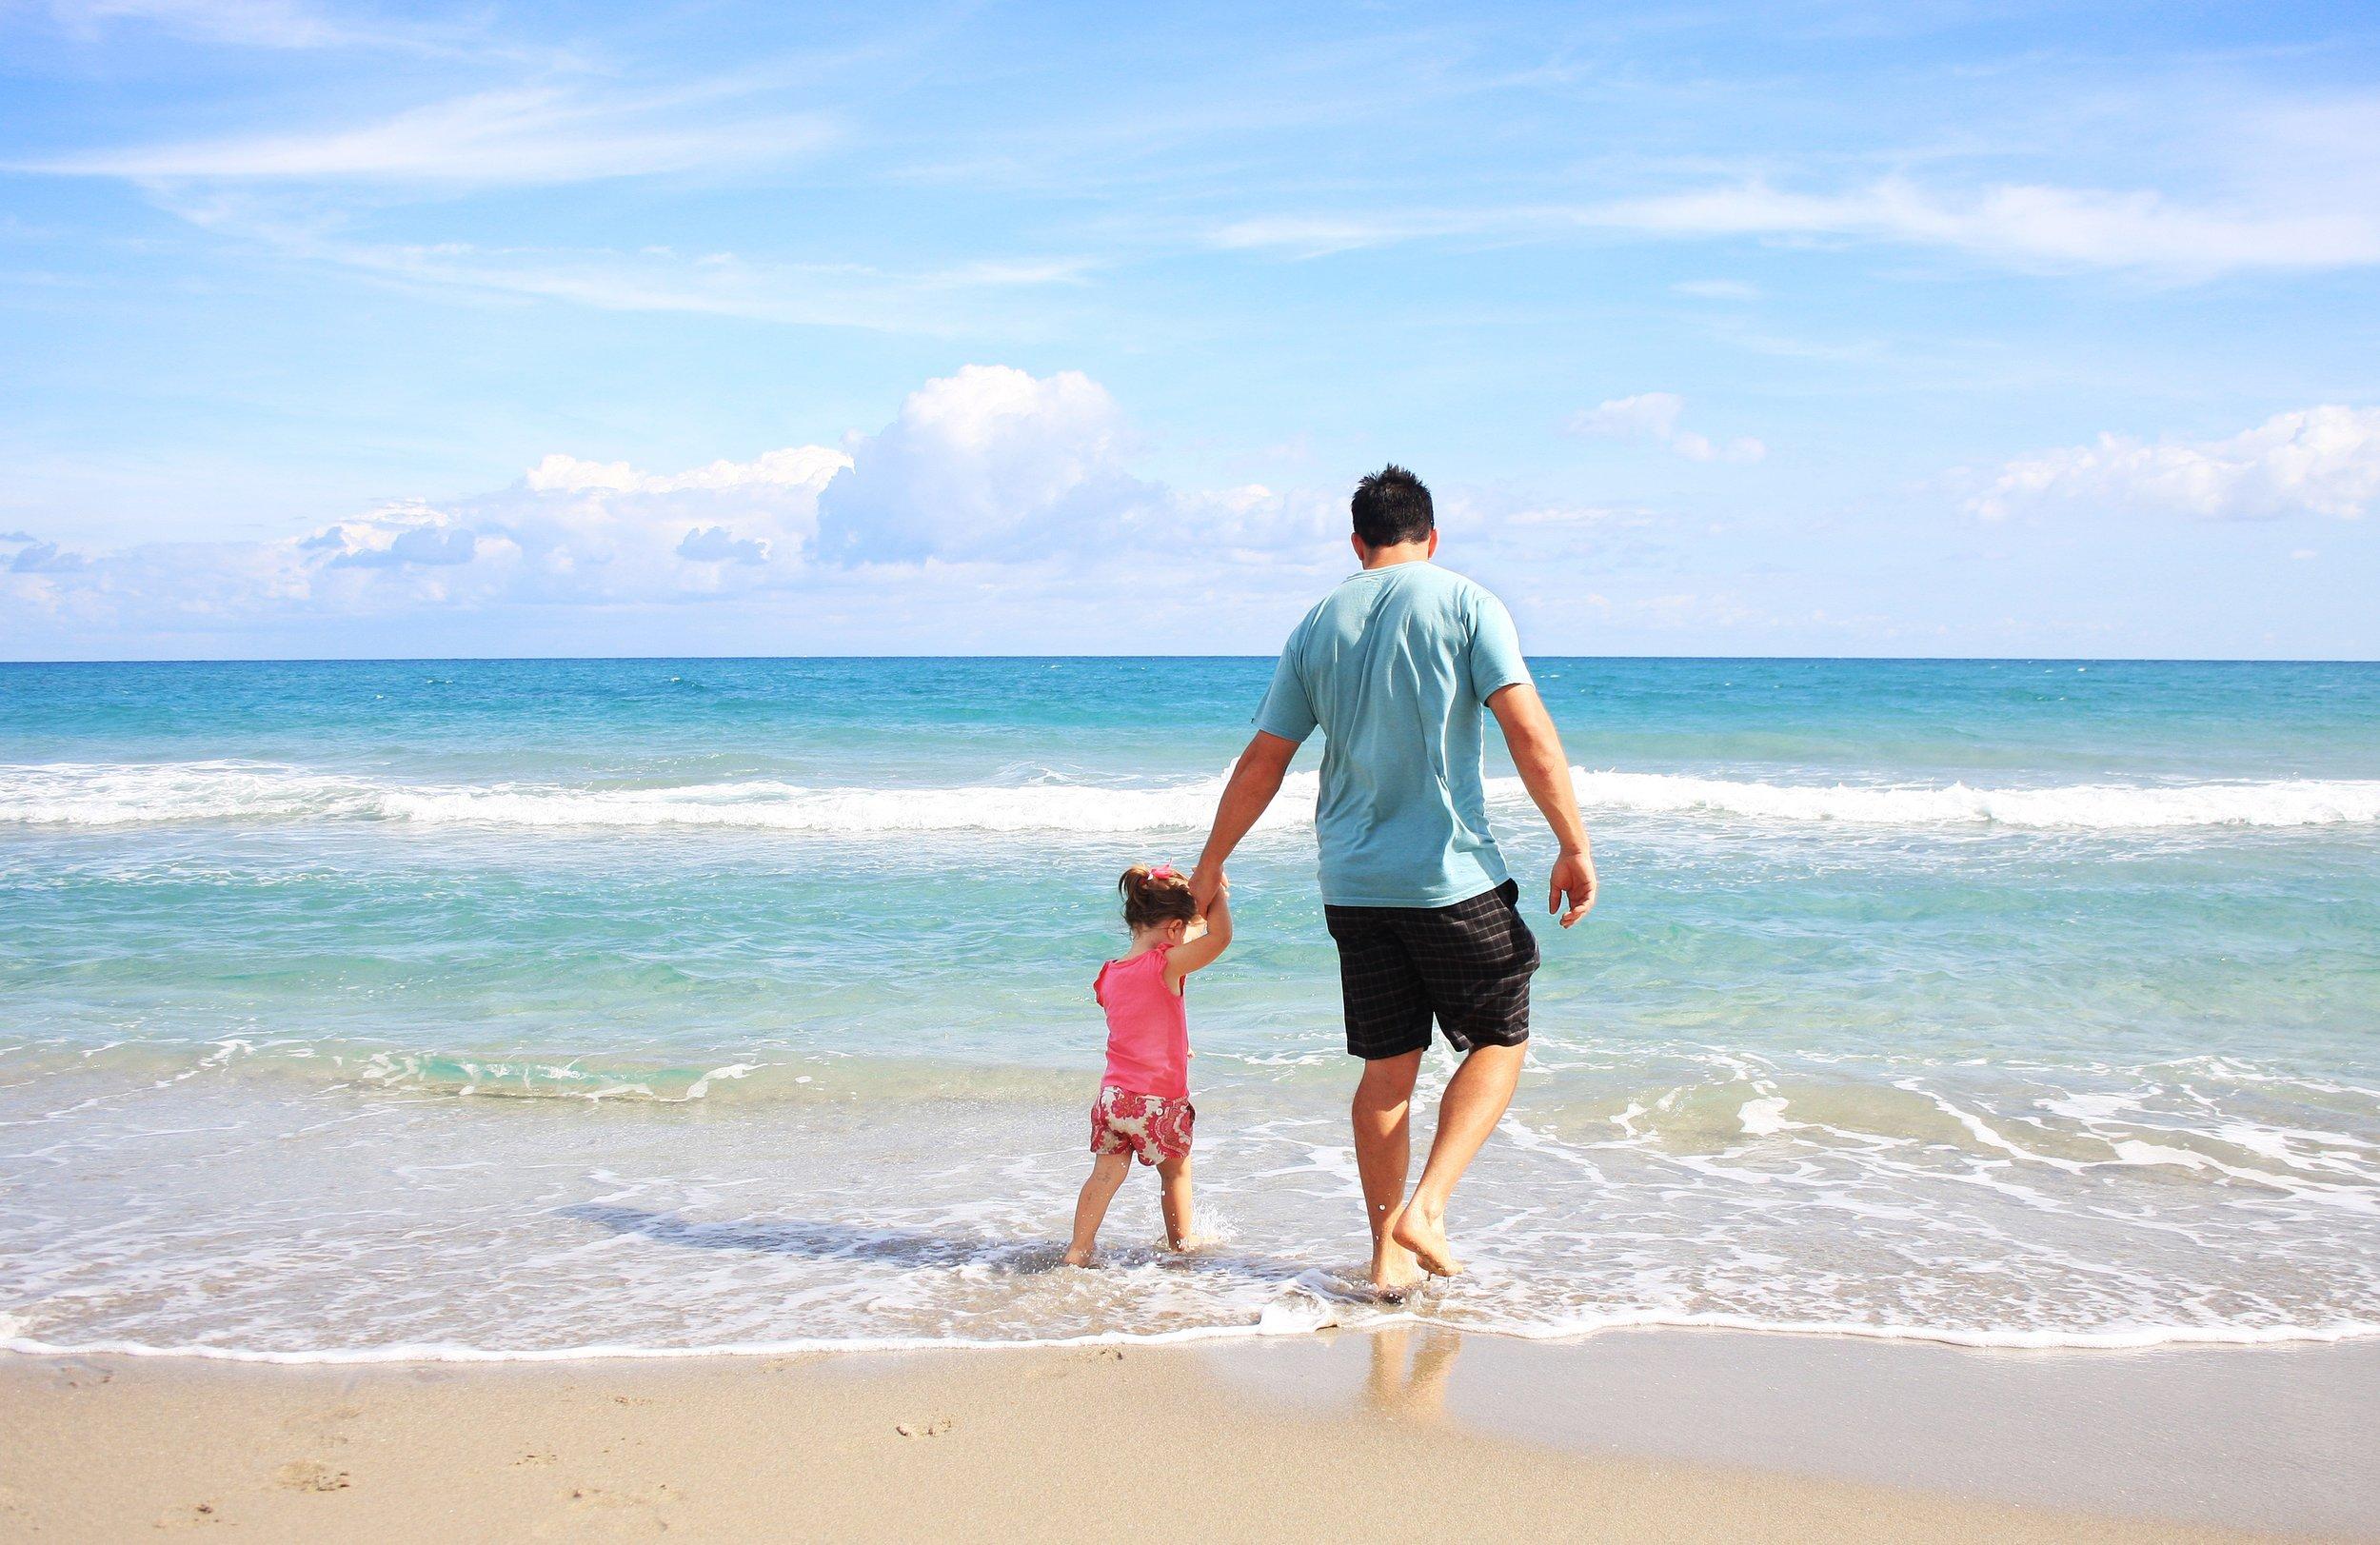 father-daughter-beach-sea-38302.jpeg